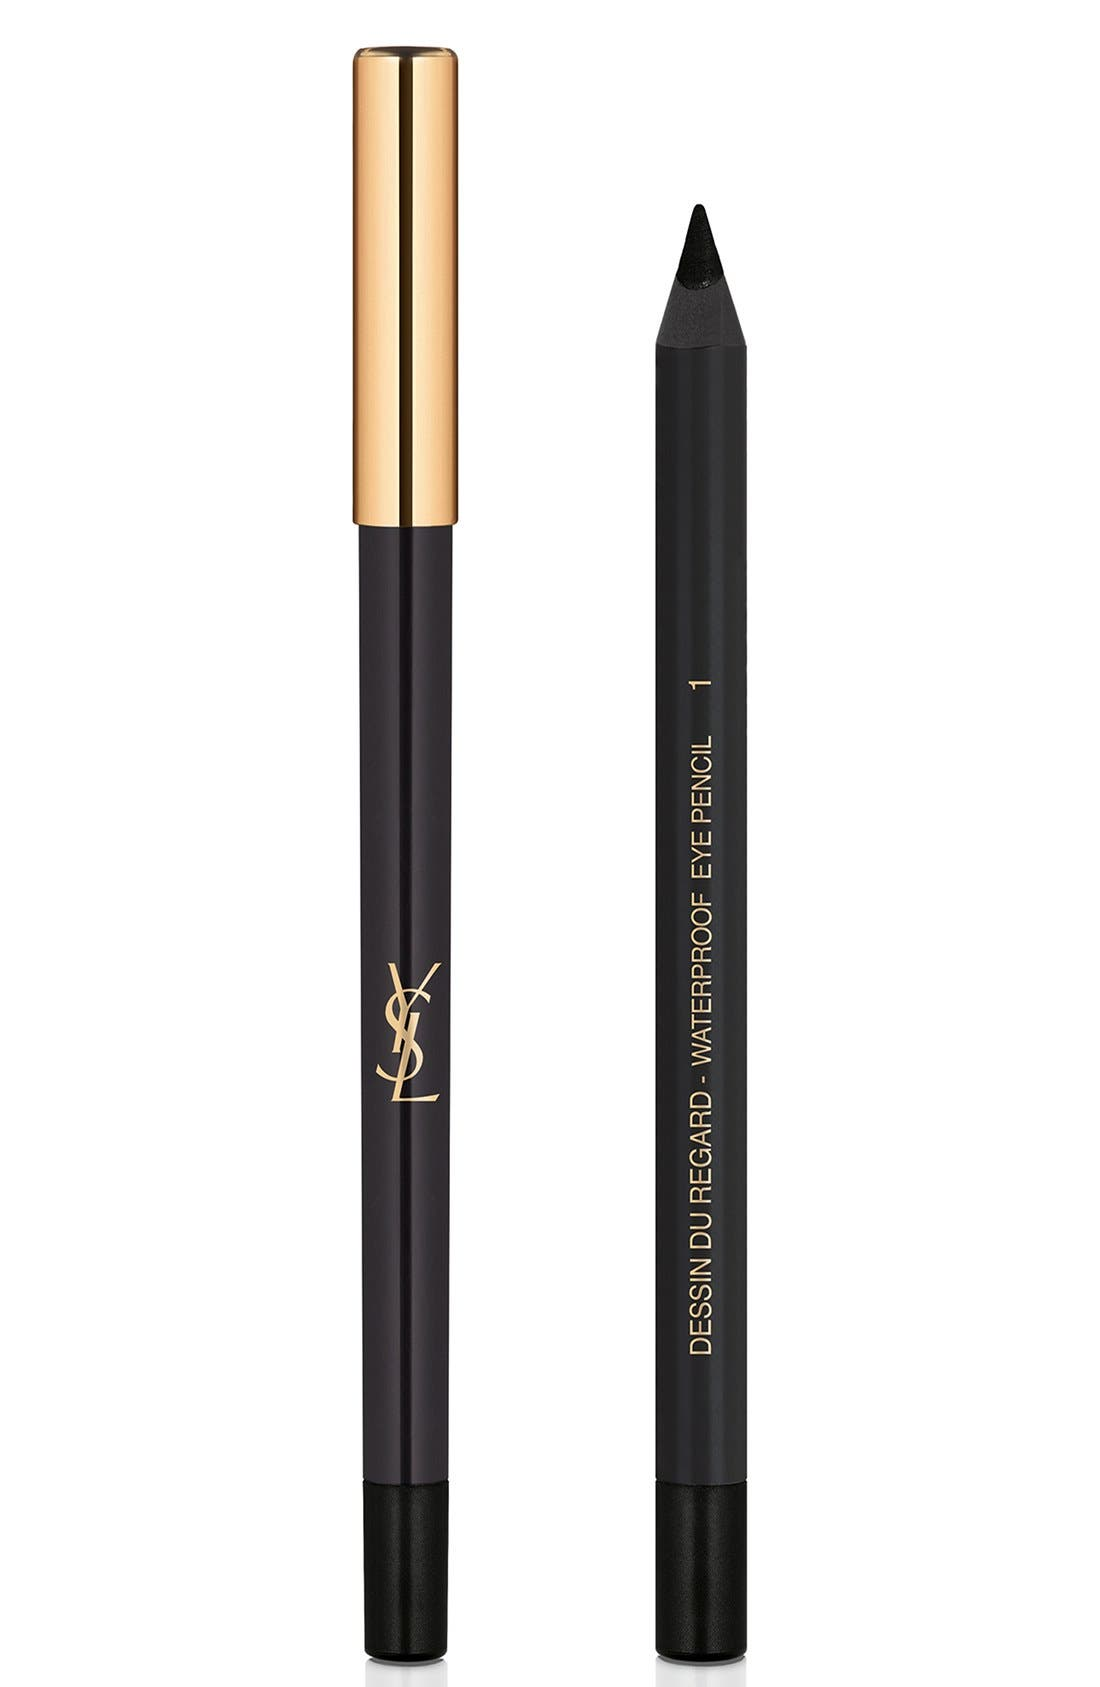 YVES SAINT LAURENT, Dessin du Regard Waterproof Eyeliner Pencil, Main thumbnail 1, color, 01 BLACK